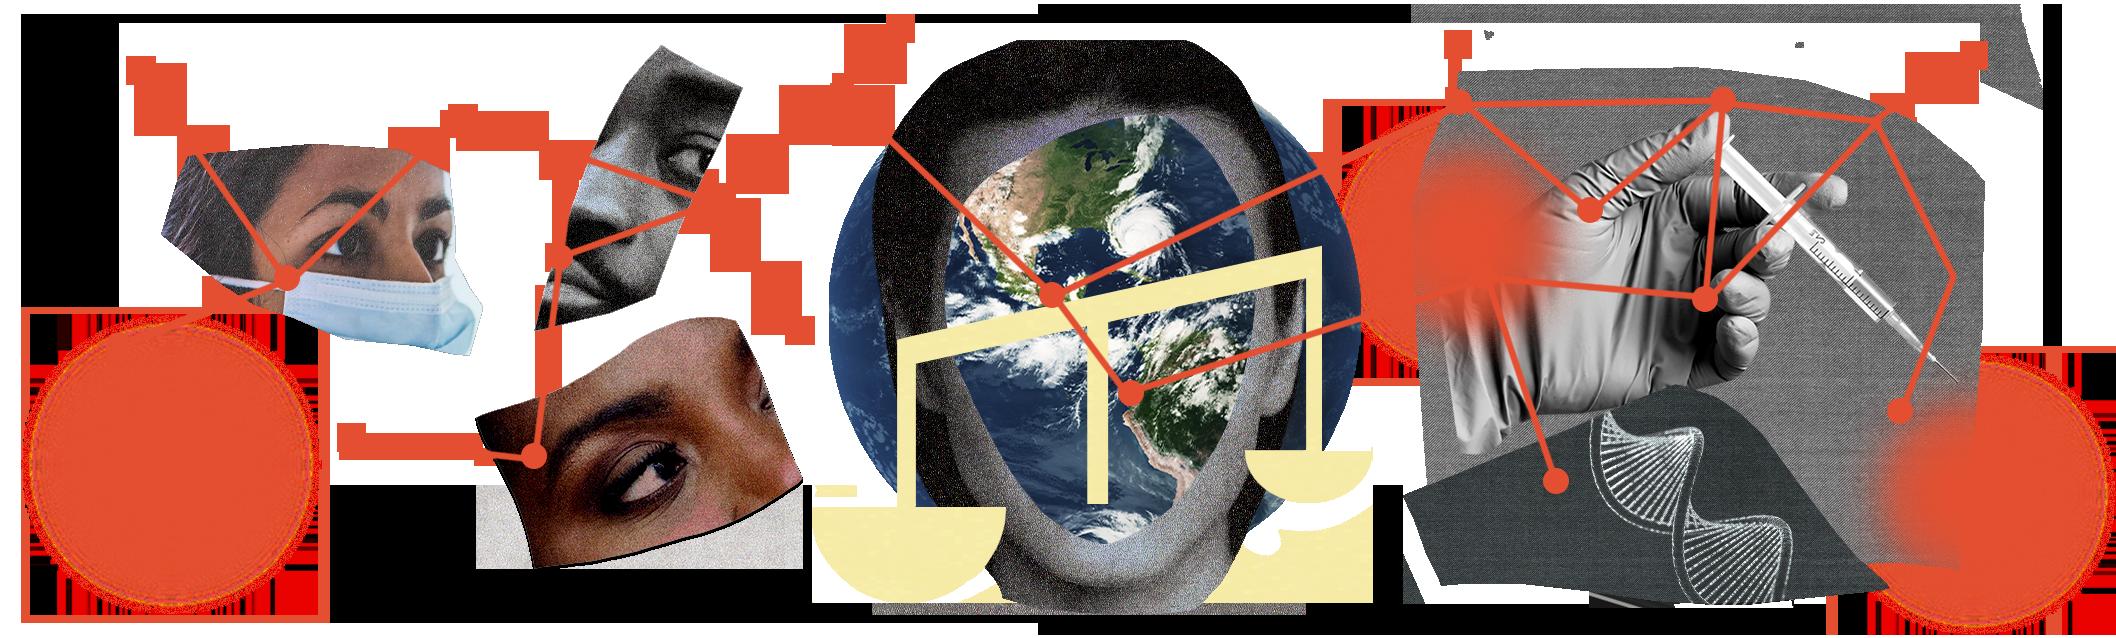 conceptual collage illustration